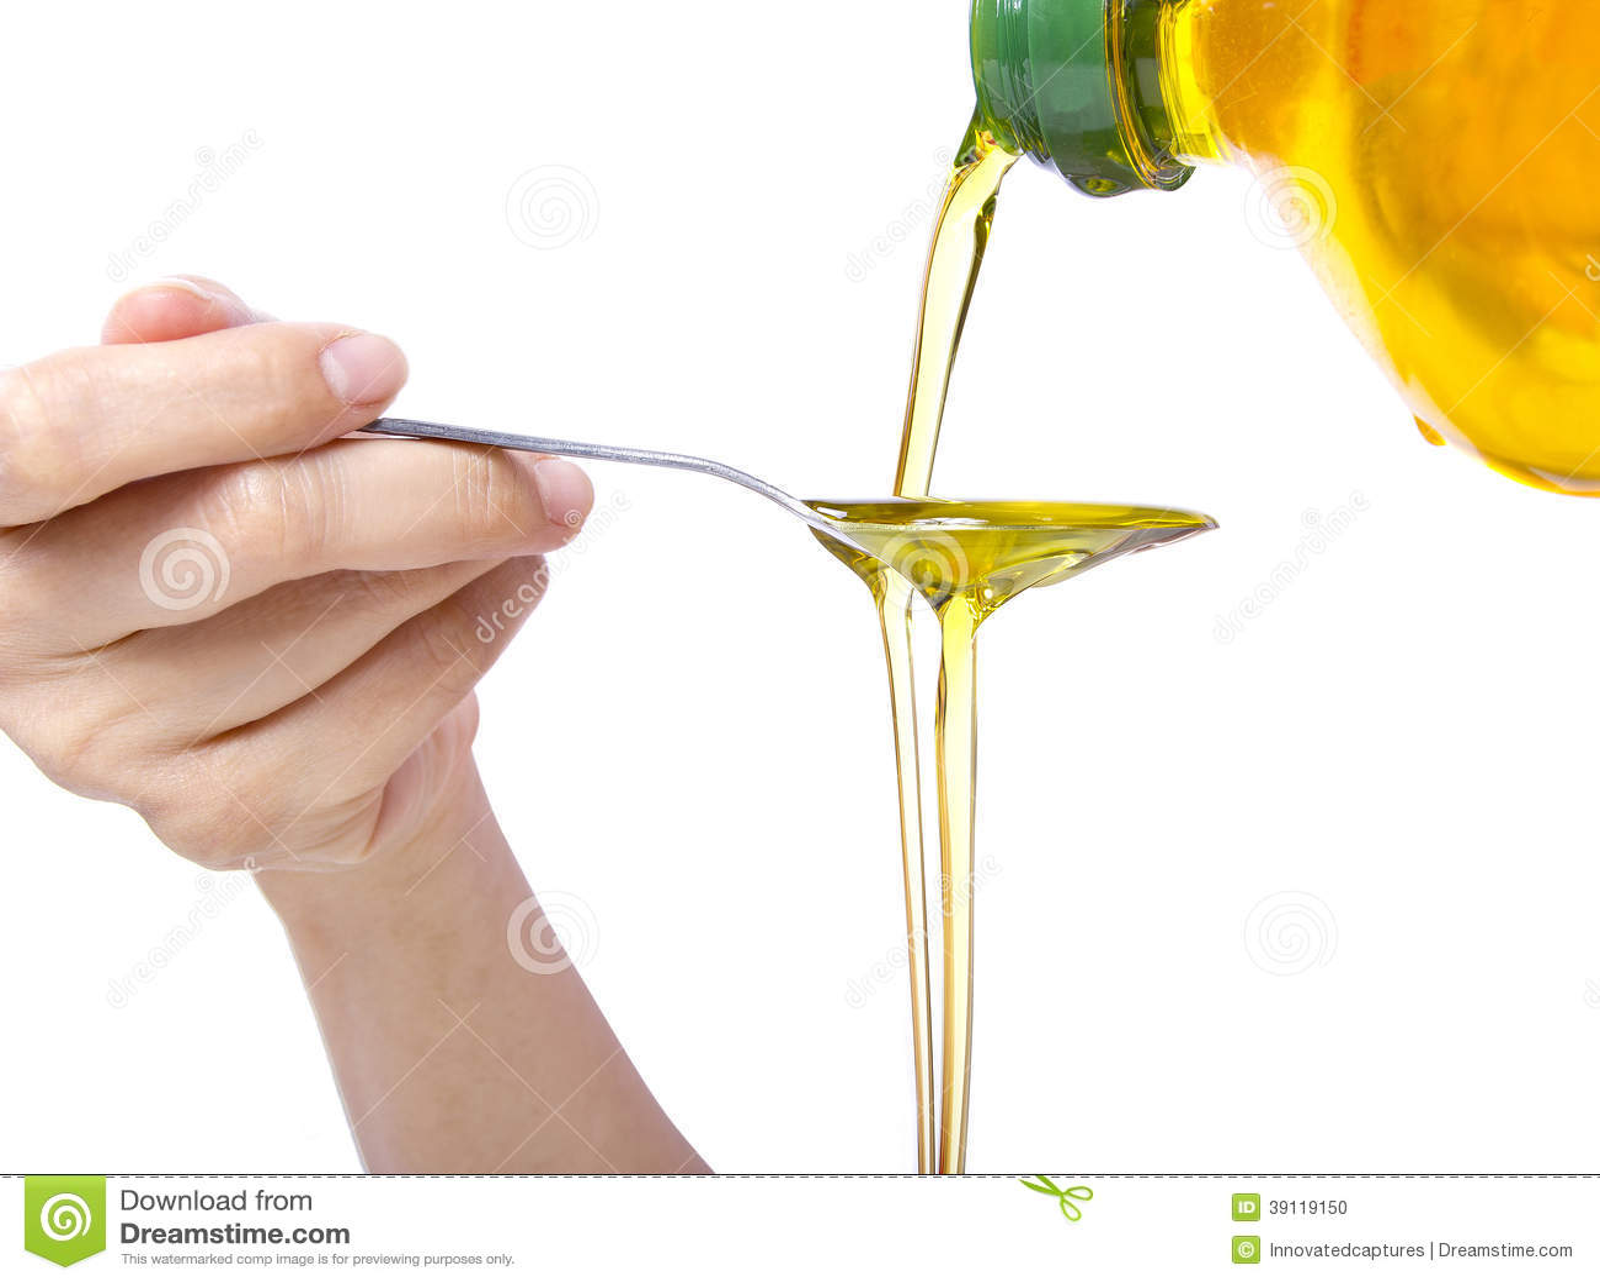 Oil Pulling / Swishing